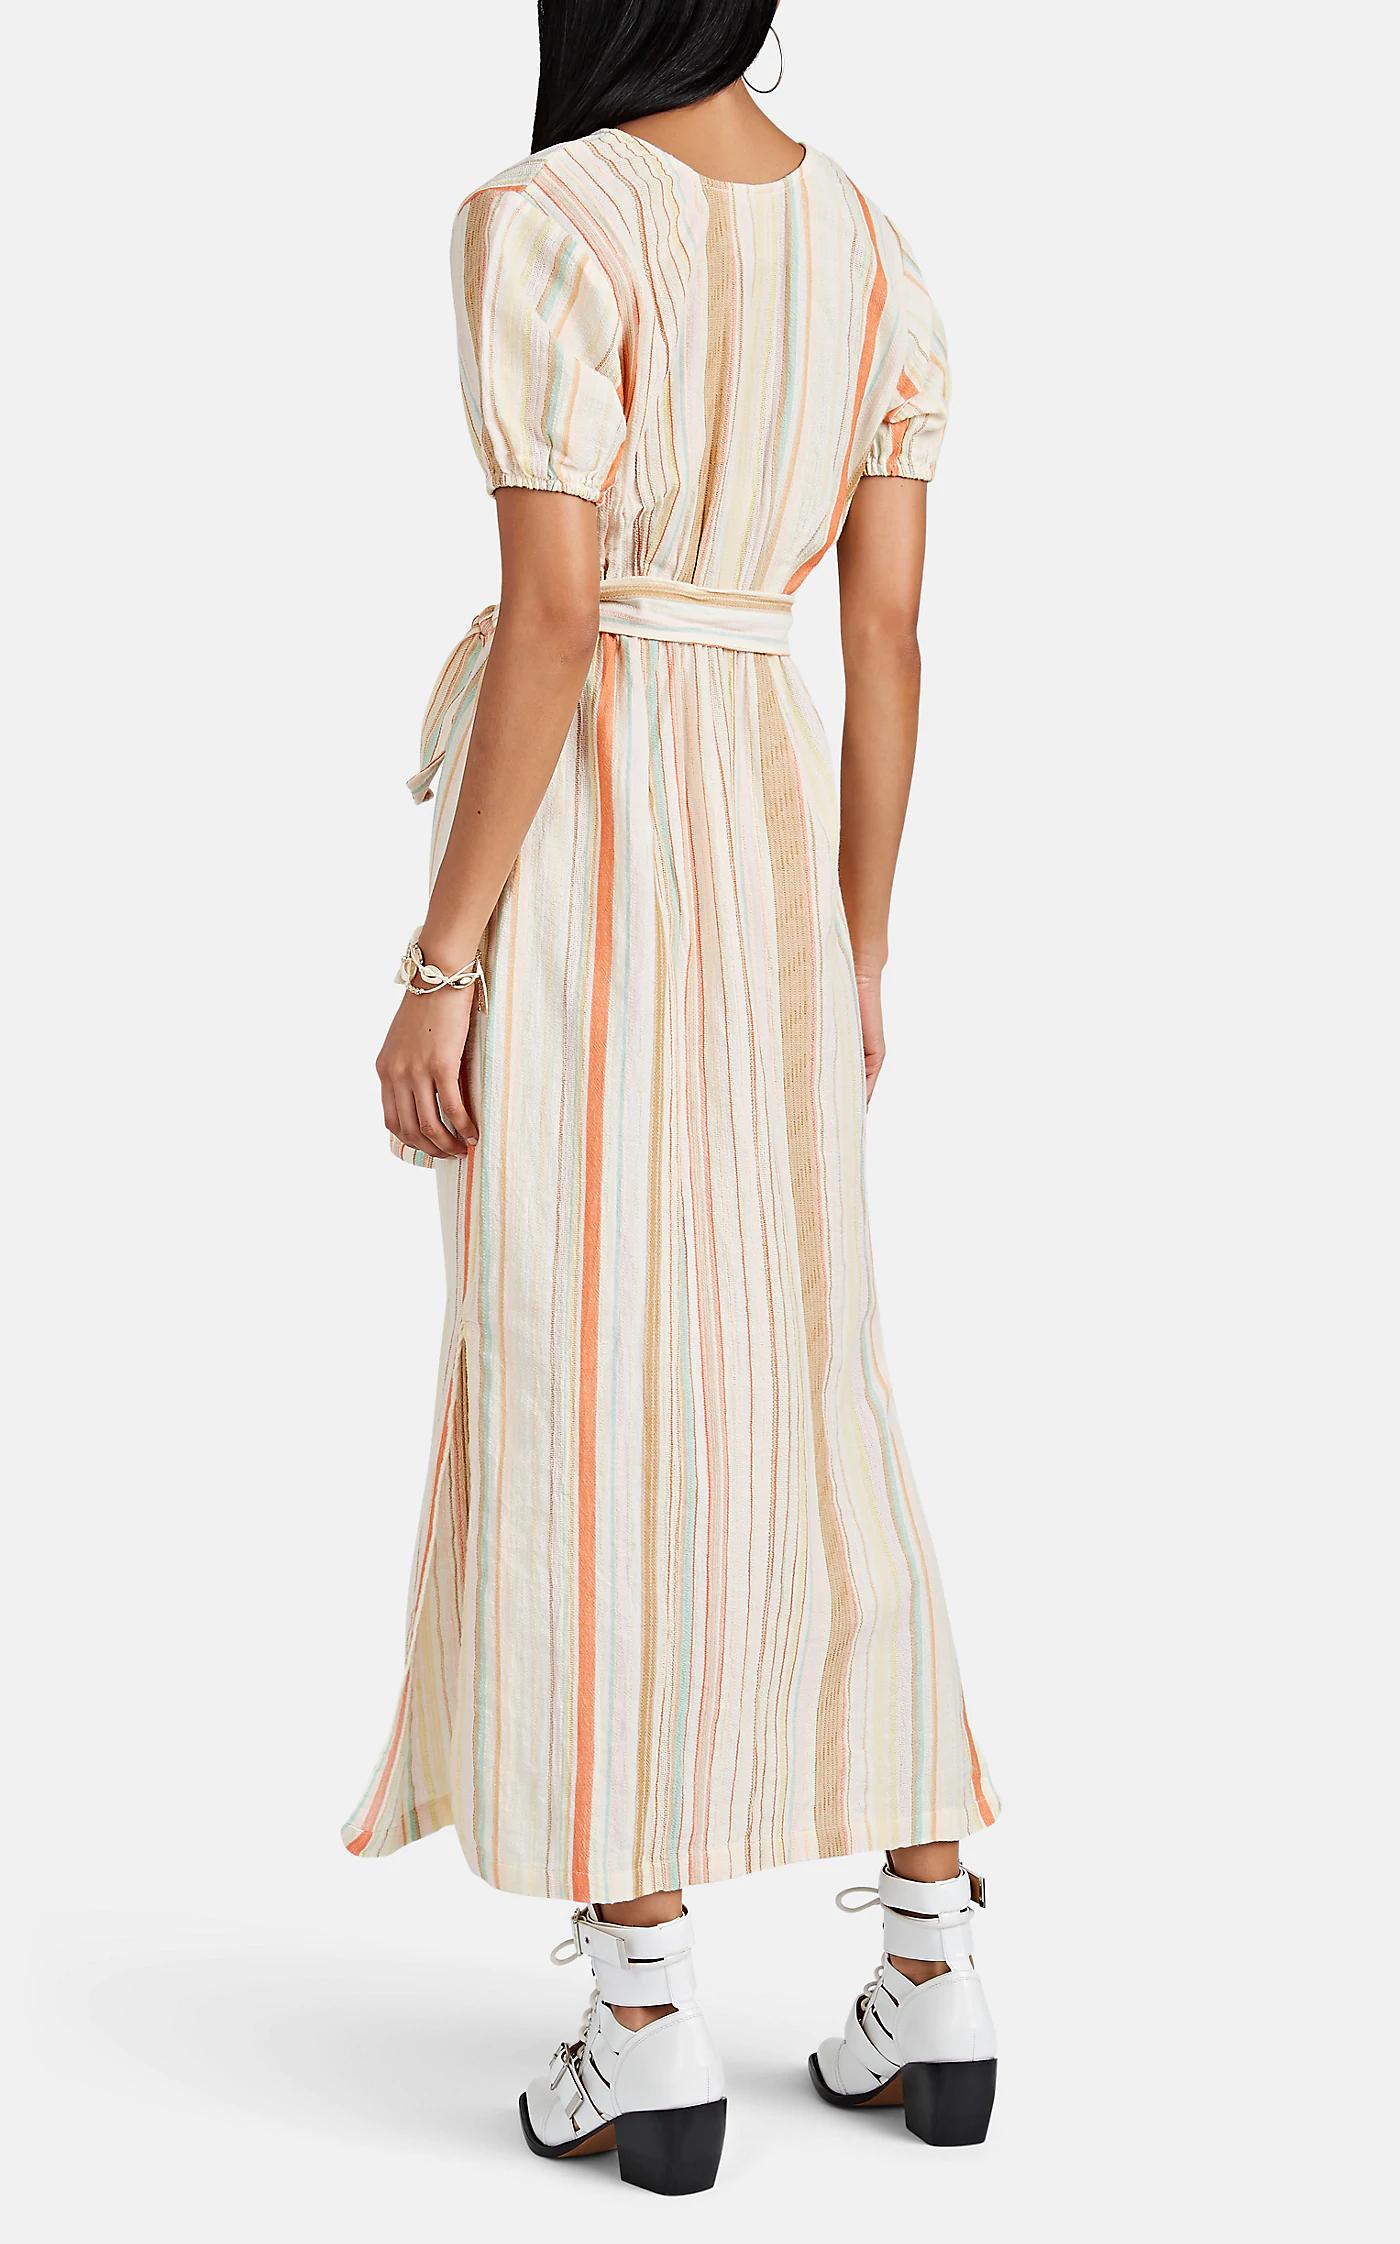 Ace Jig Georgie Striped Cotton Gauze Midi Dress Barneys New York Dresses Midi Dress Ace And Jig [ 2244 x 1400 Pixel ]